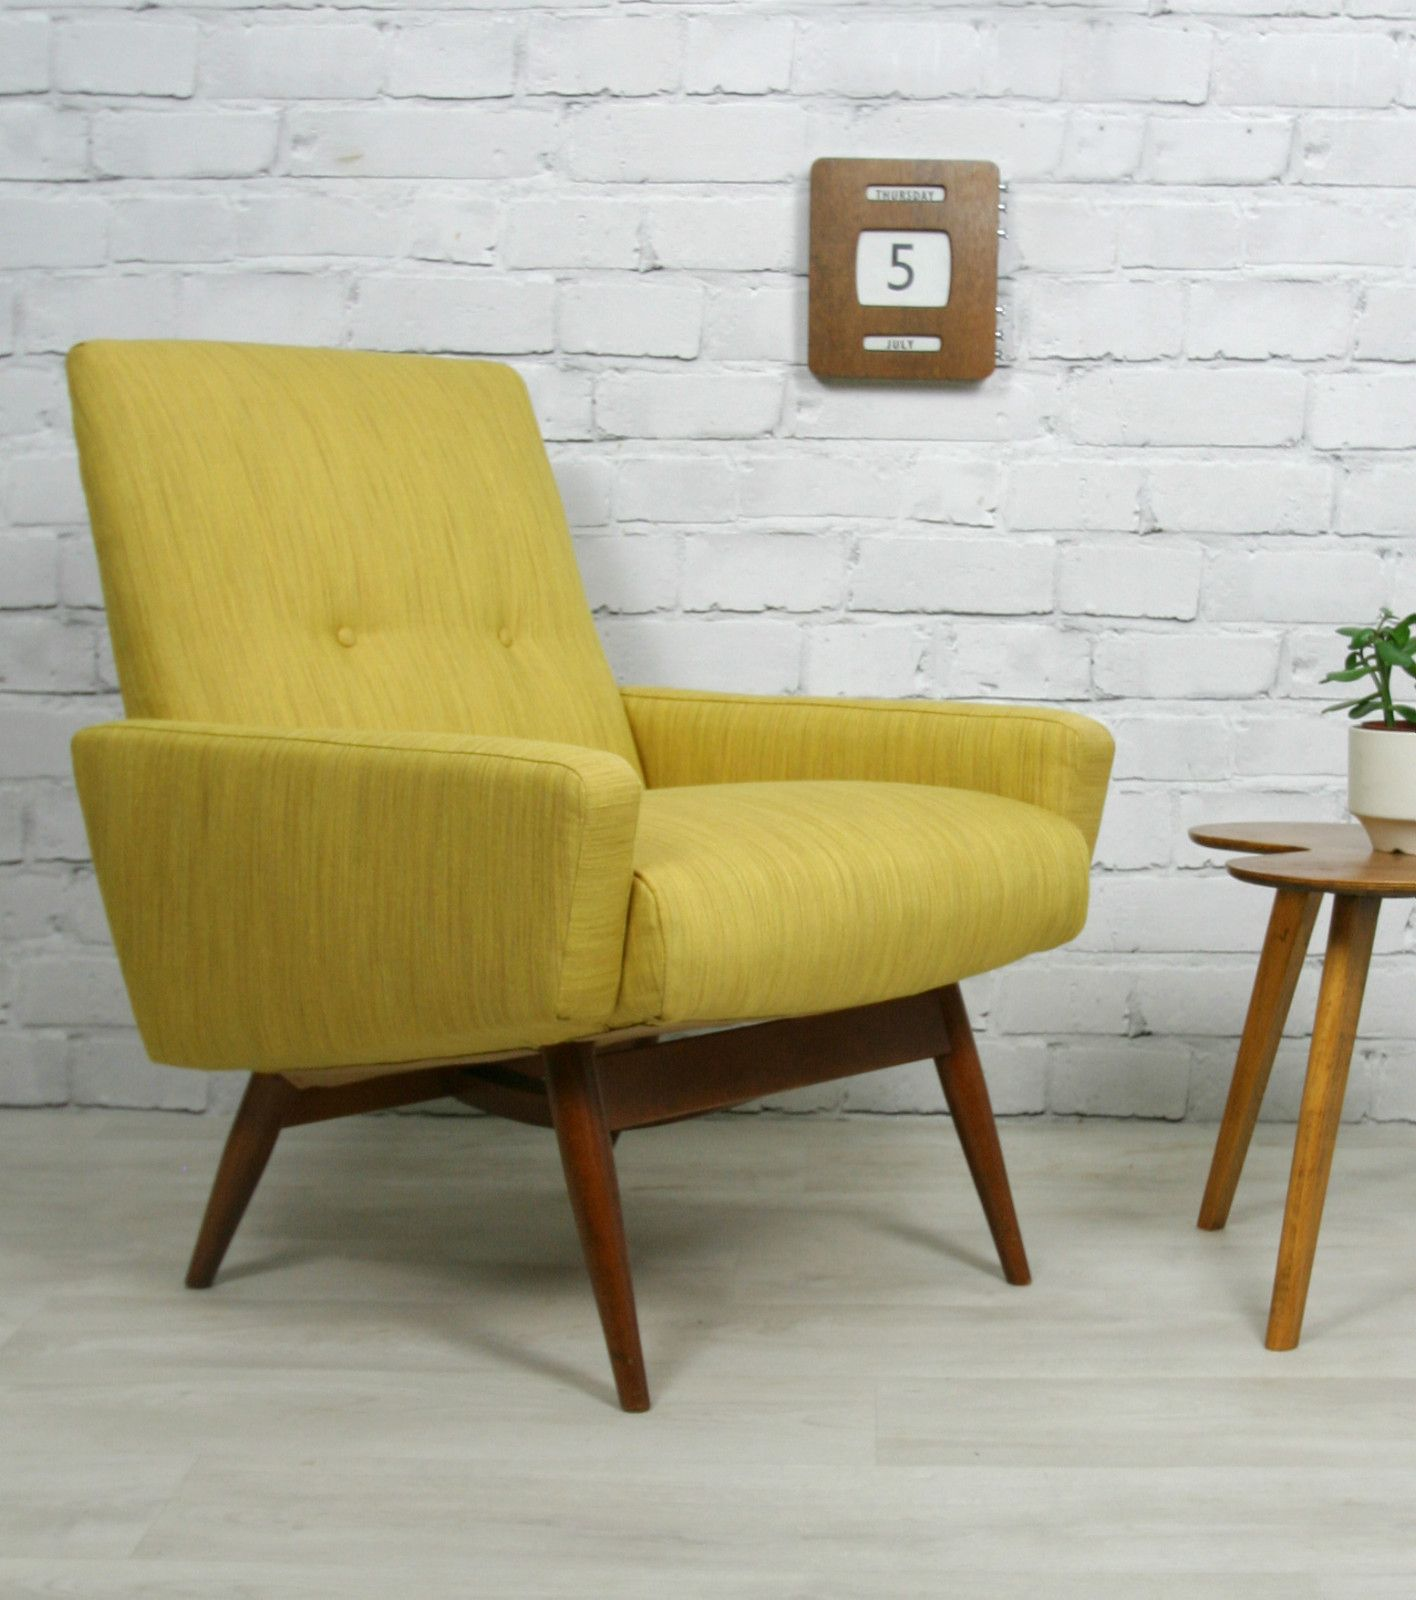 Parker Knoll Vintage Retro Teak Mid Century Danish Style Armchair Chair 50s 60s Inredning Möbler Inredning Möbler